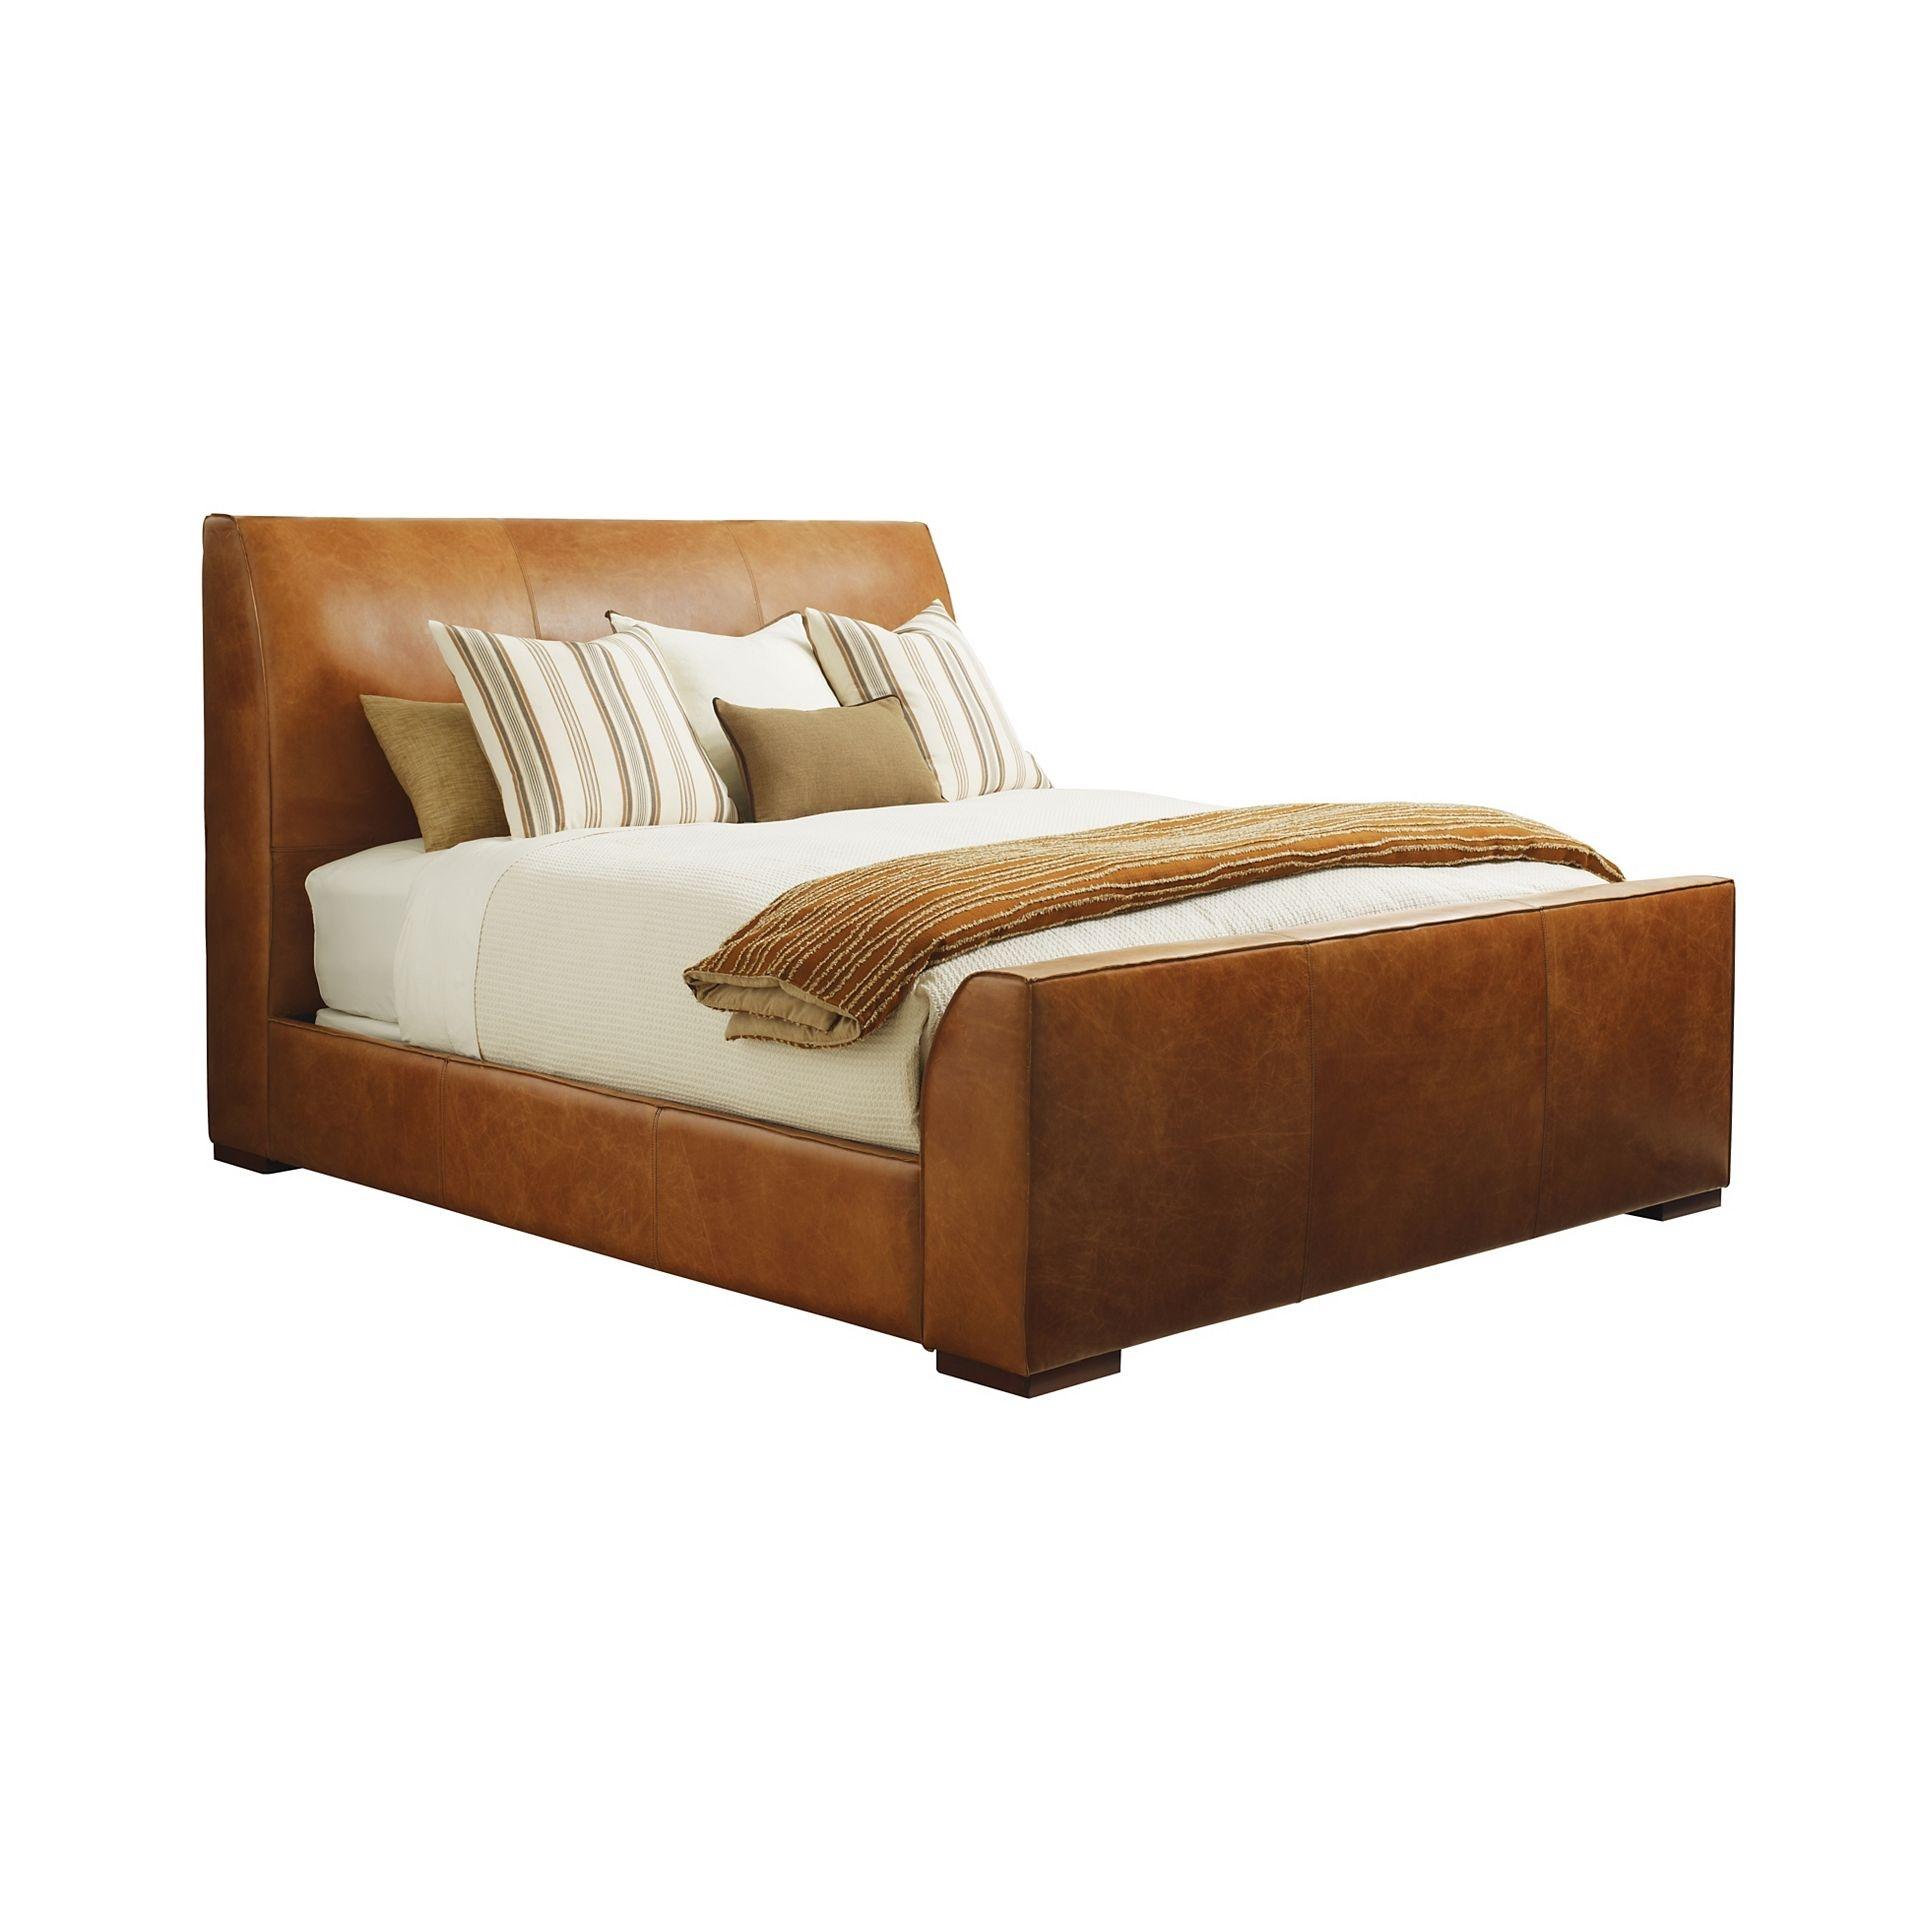 Henredon Furniture Henredon Leather Company Garrow Bed, 6/6 (King) IL8866